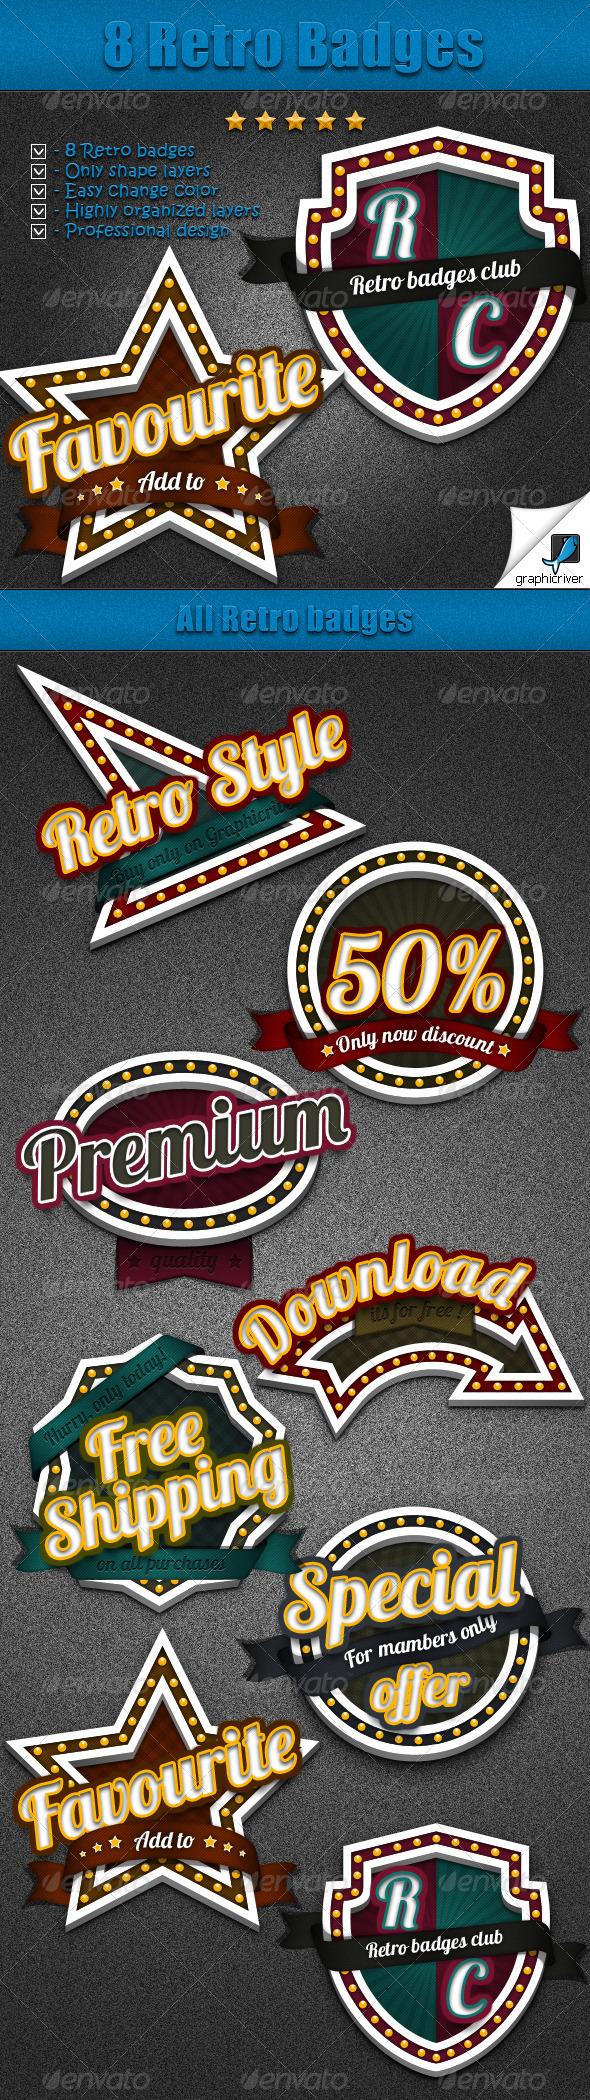 8 Retro Badges - Badges & Stickers Web Elements